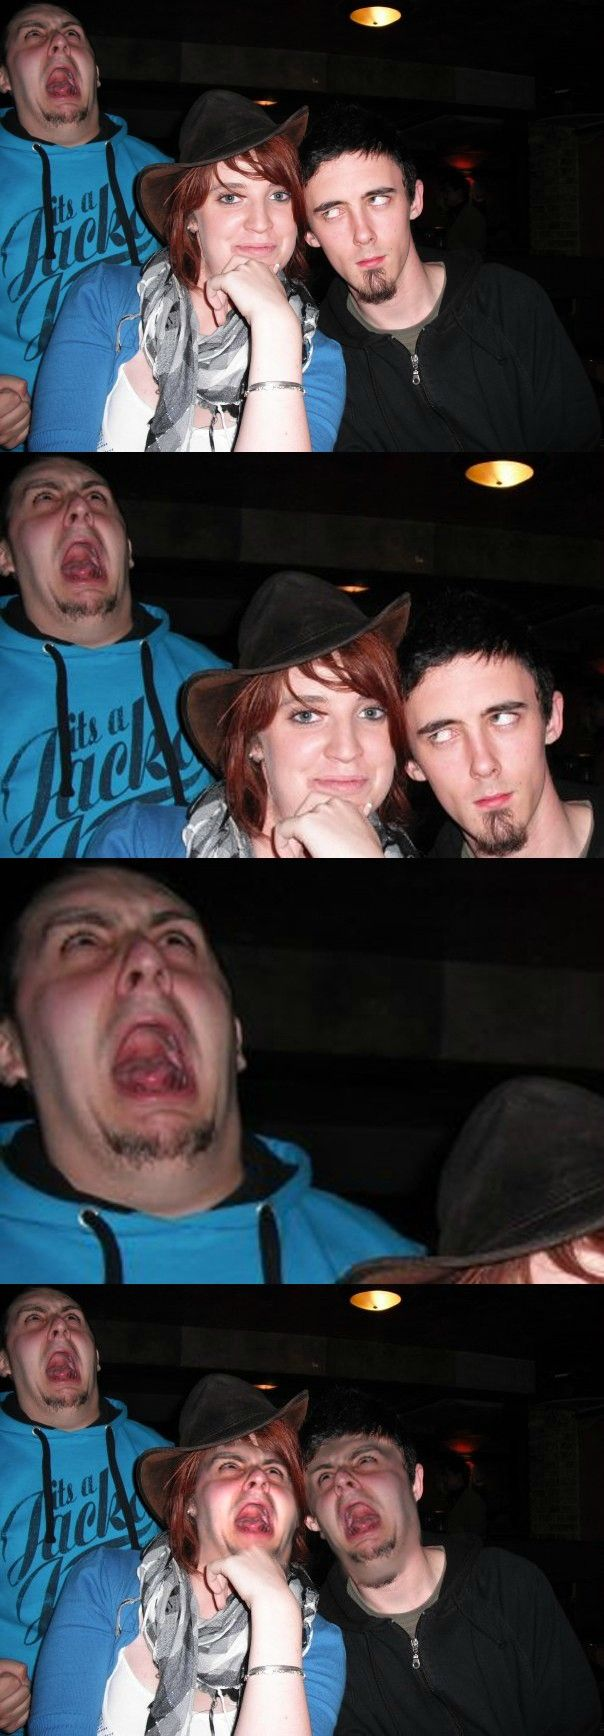 Photobomb Face Swap - I laughed sooo hard at this!!